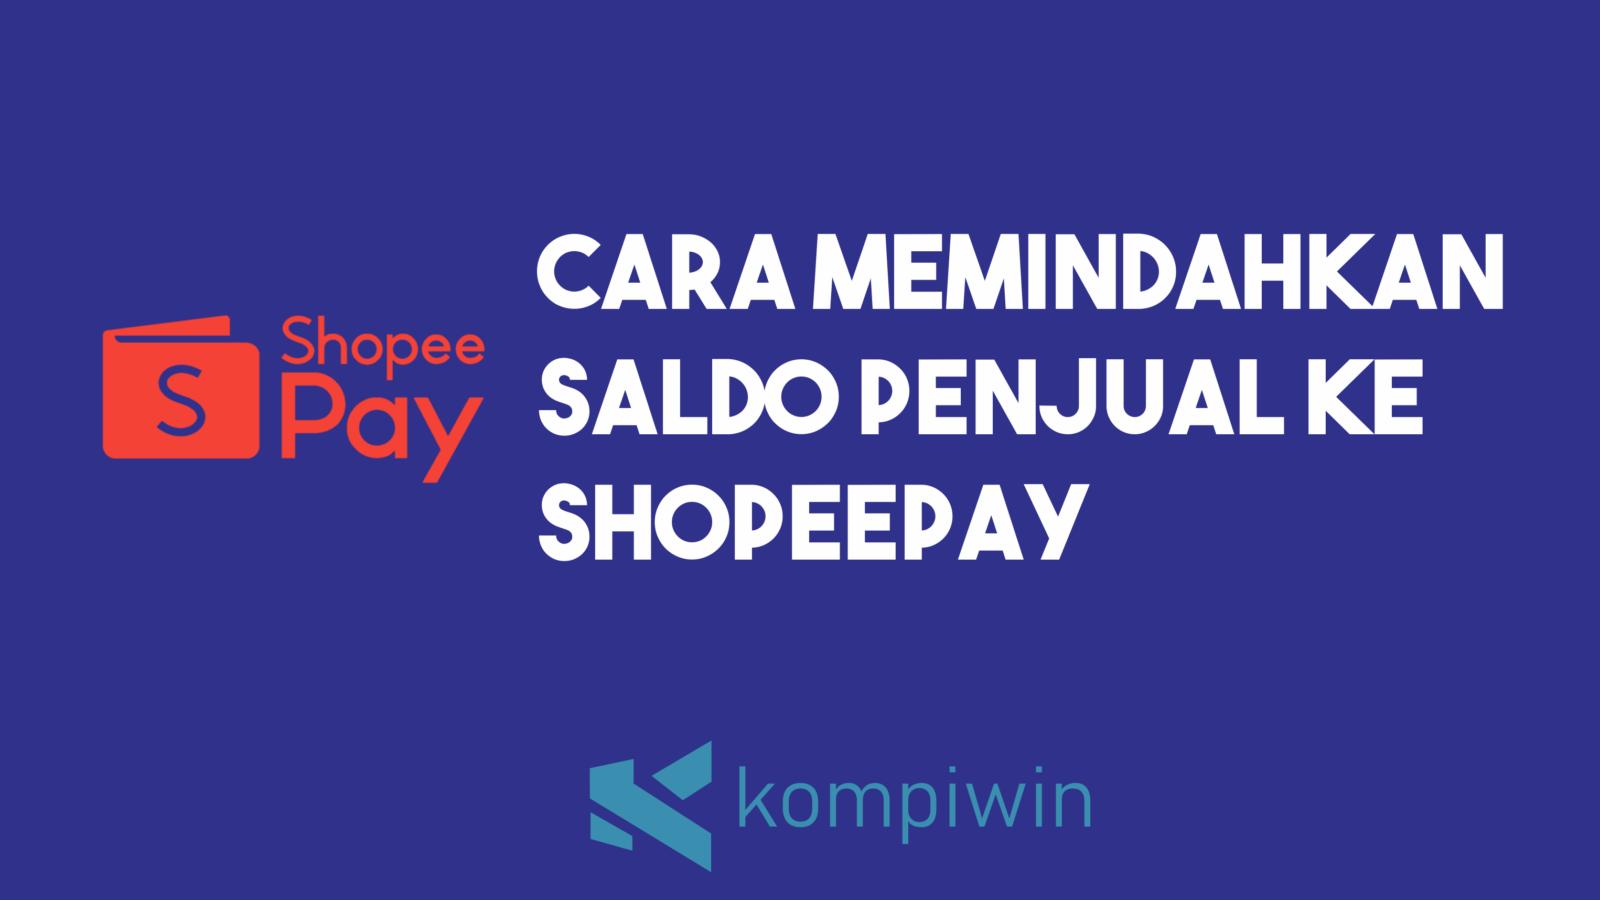 Cara Memindahkan Saldo Penjual Ke ShopeePay 7